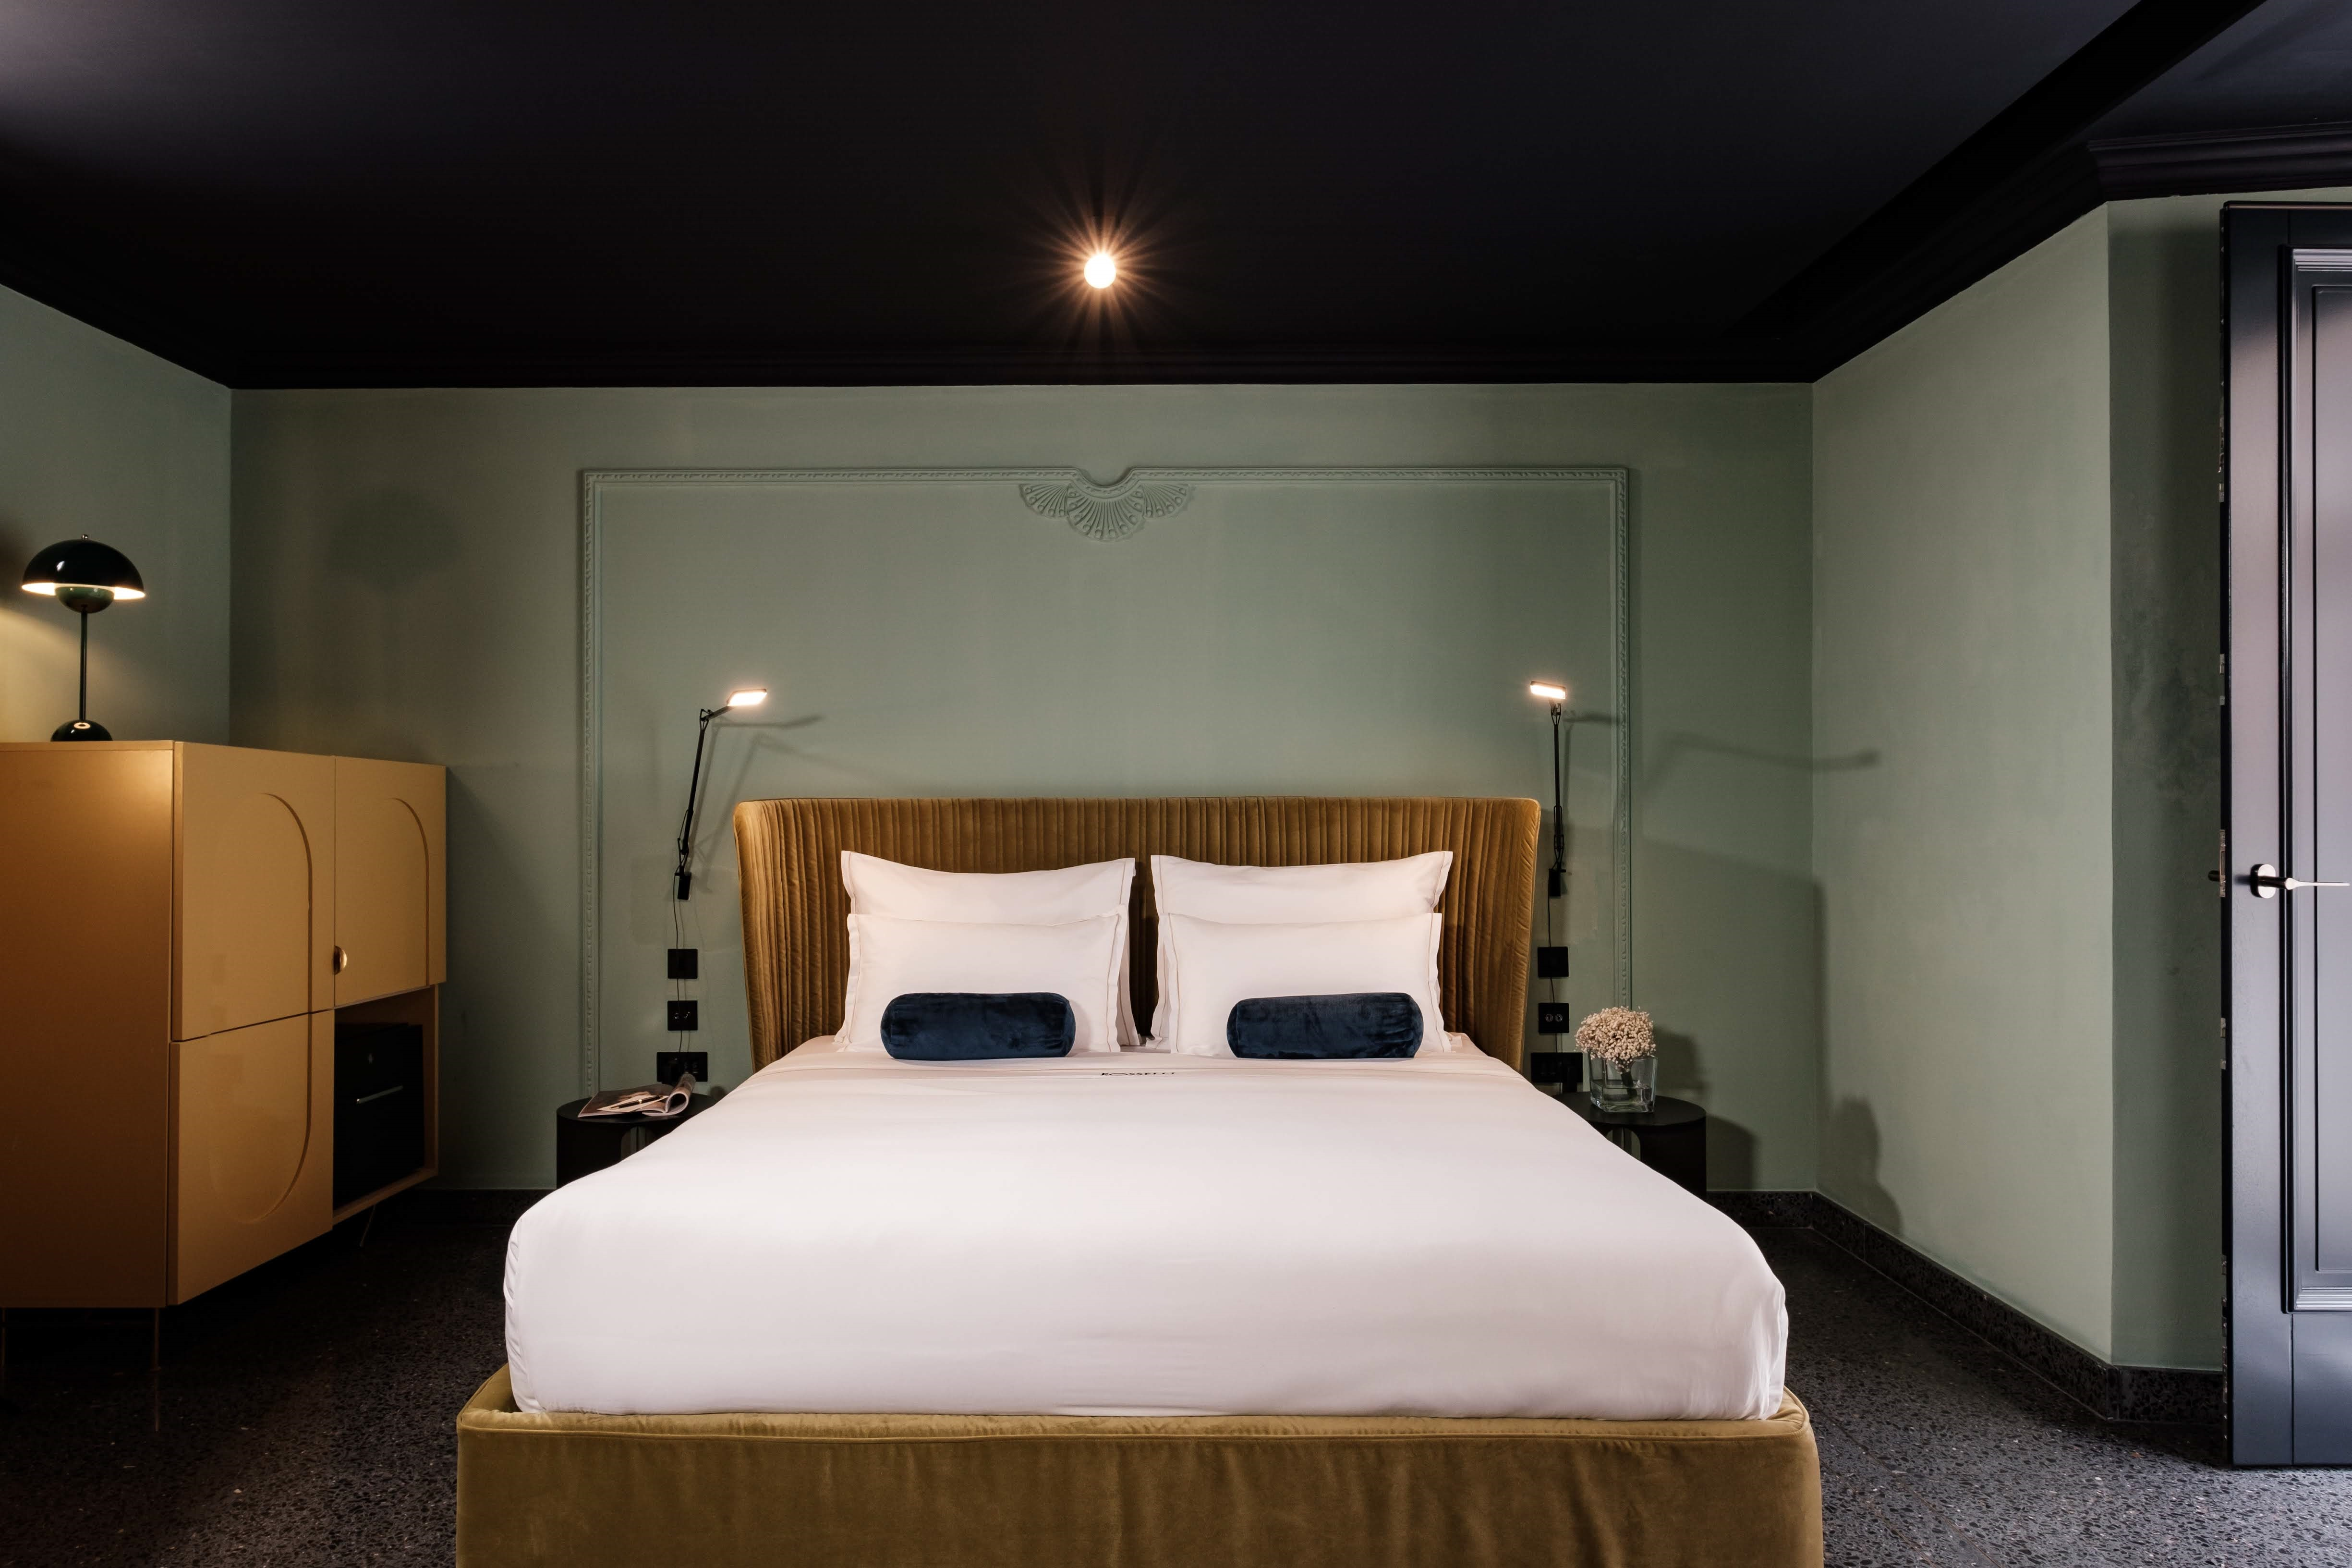 Rosseli, Maruzzo comfort rooms